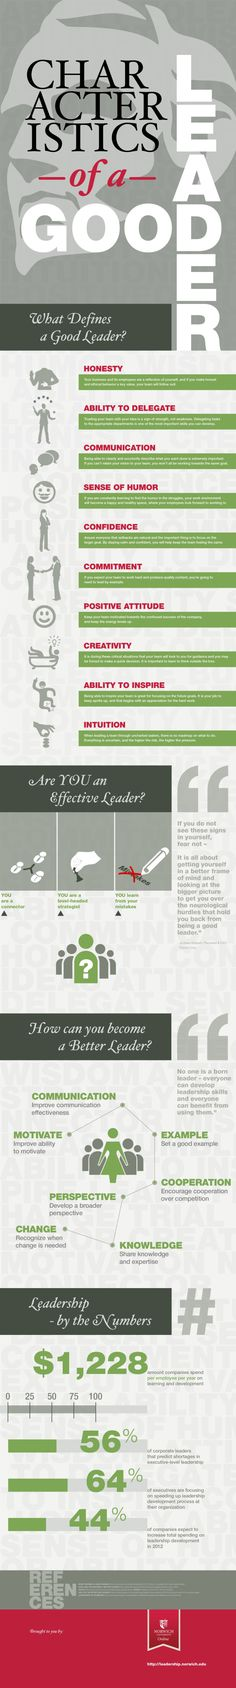 Characteristics of a Good Leader #INFOGRAPHIC #infografía